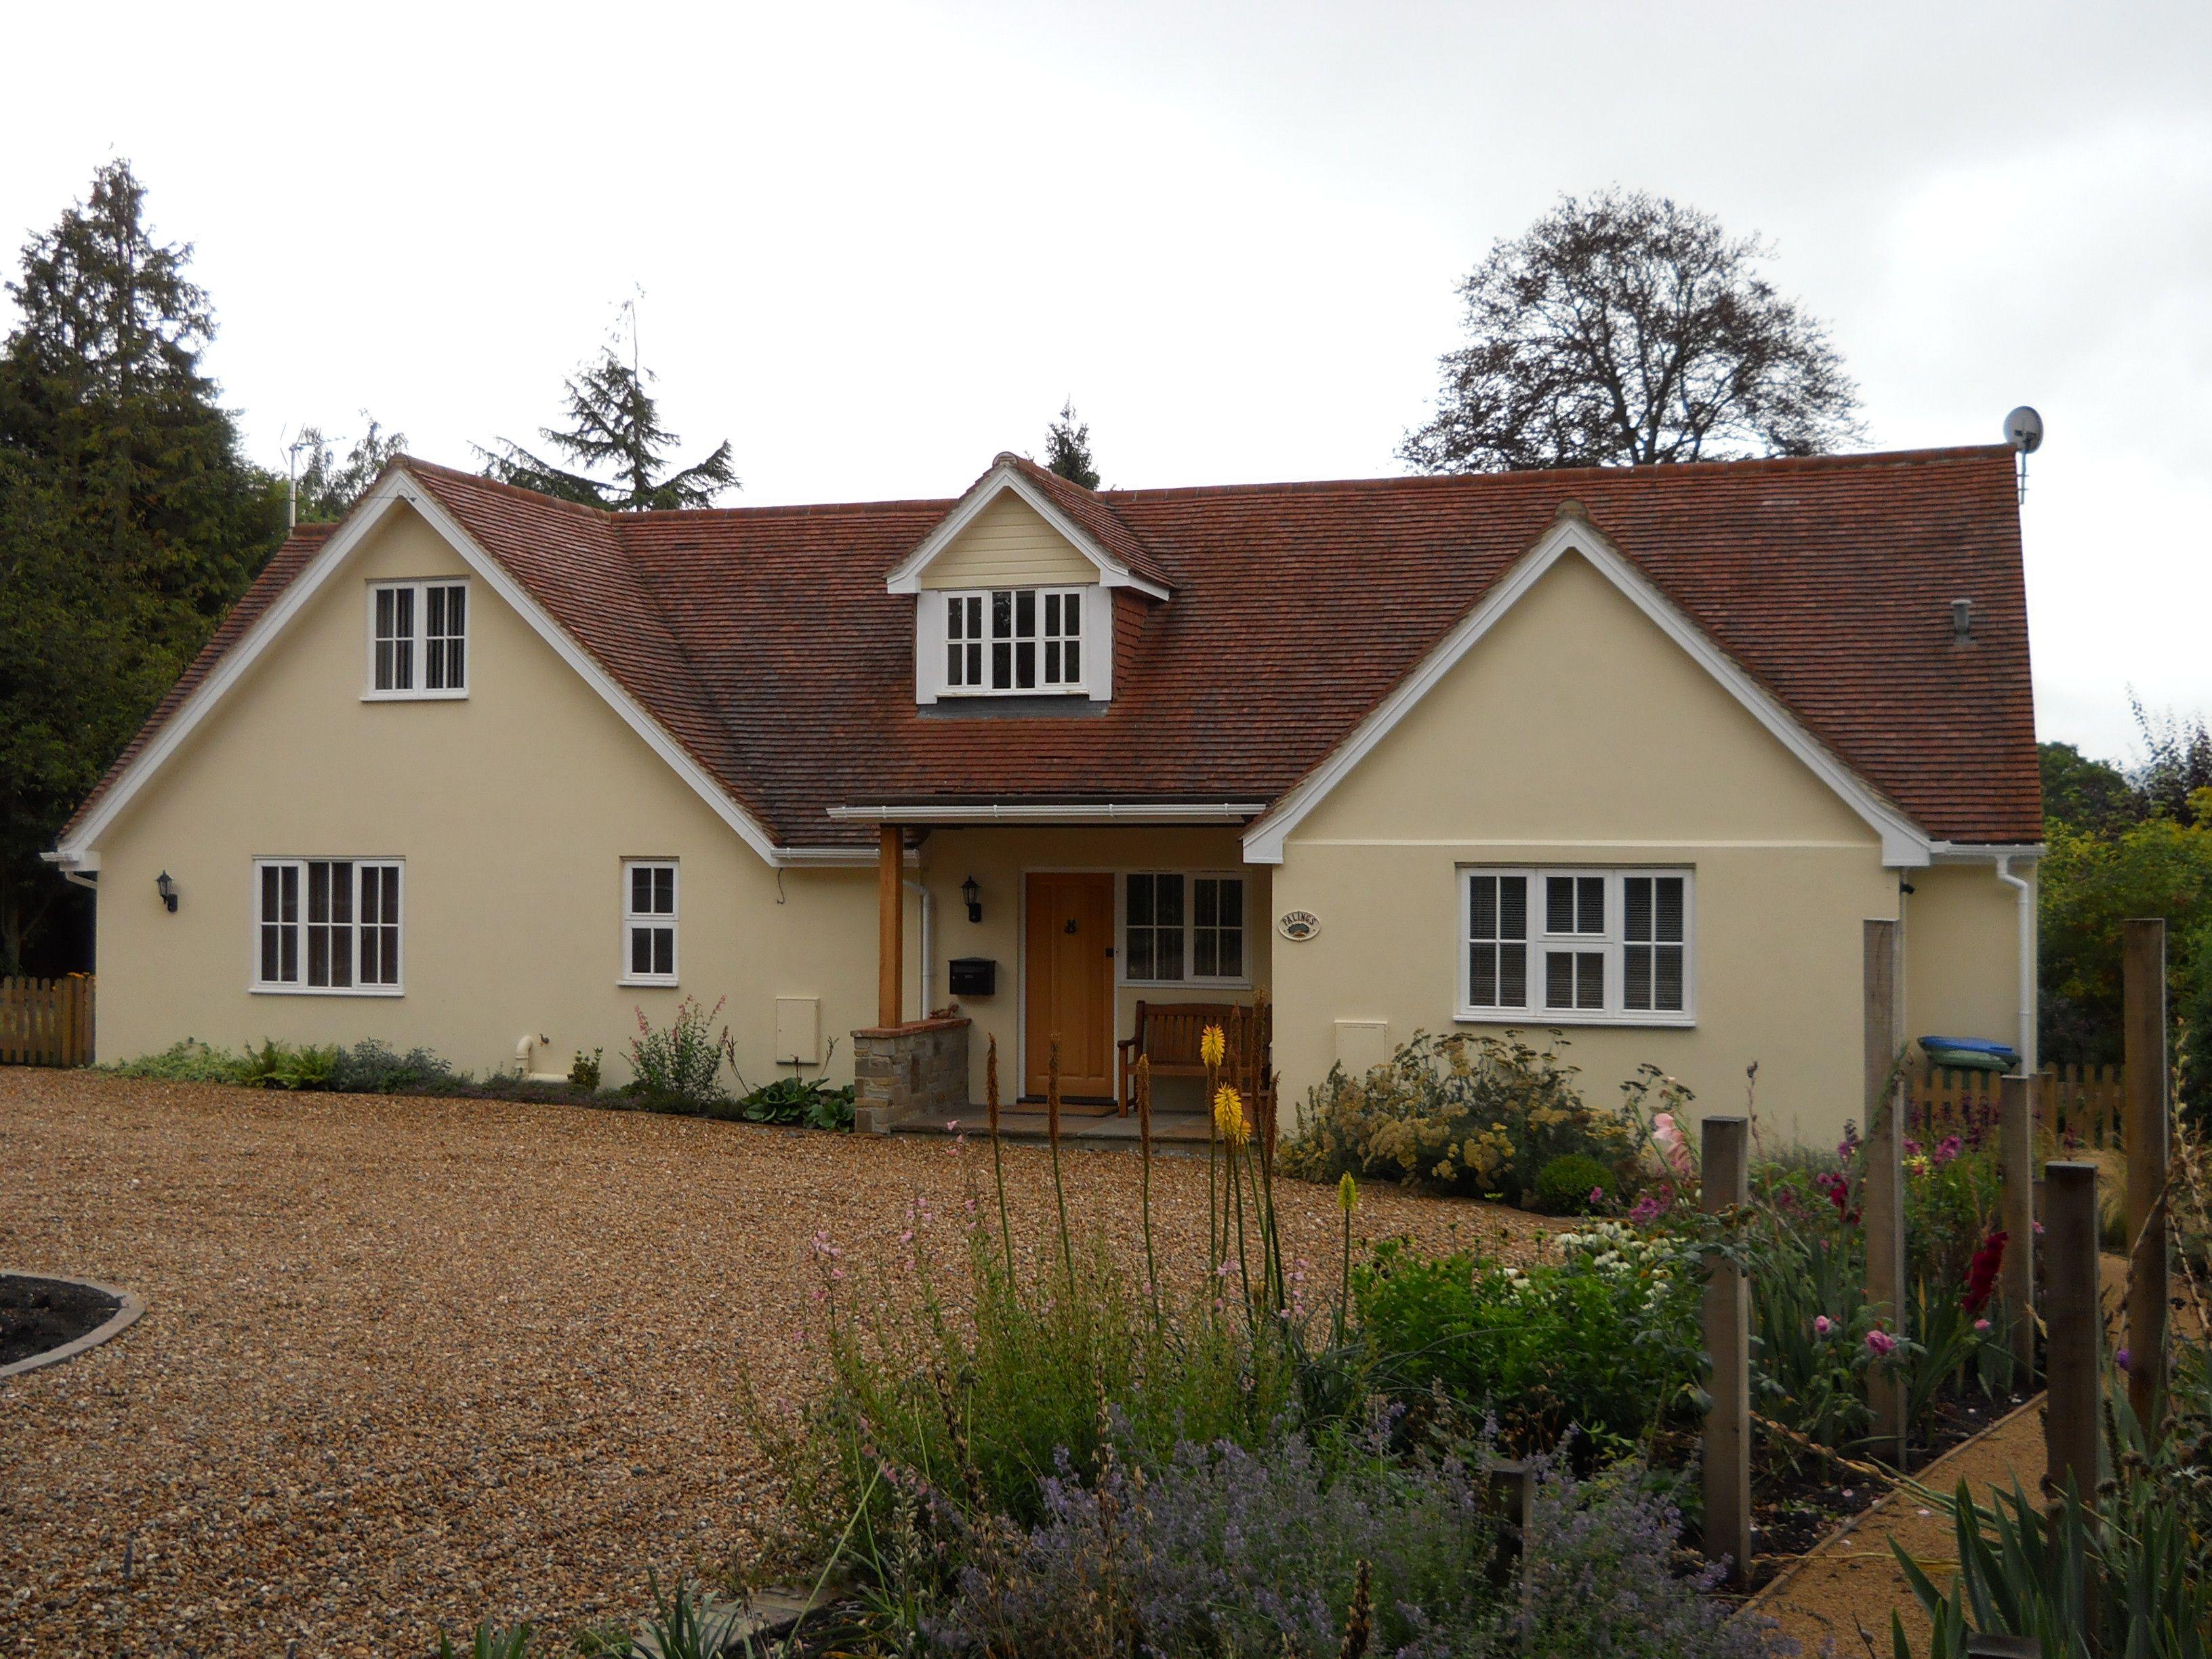 Building refurbishment horizon design ideas for the for Chalet style bungalow images